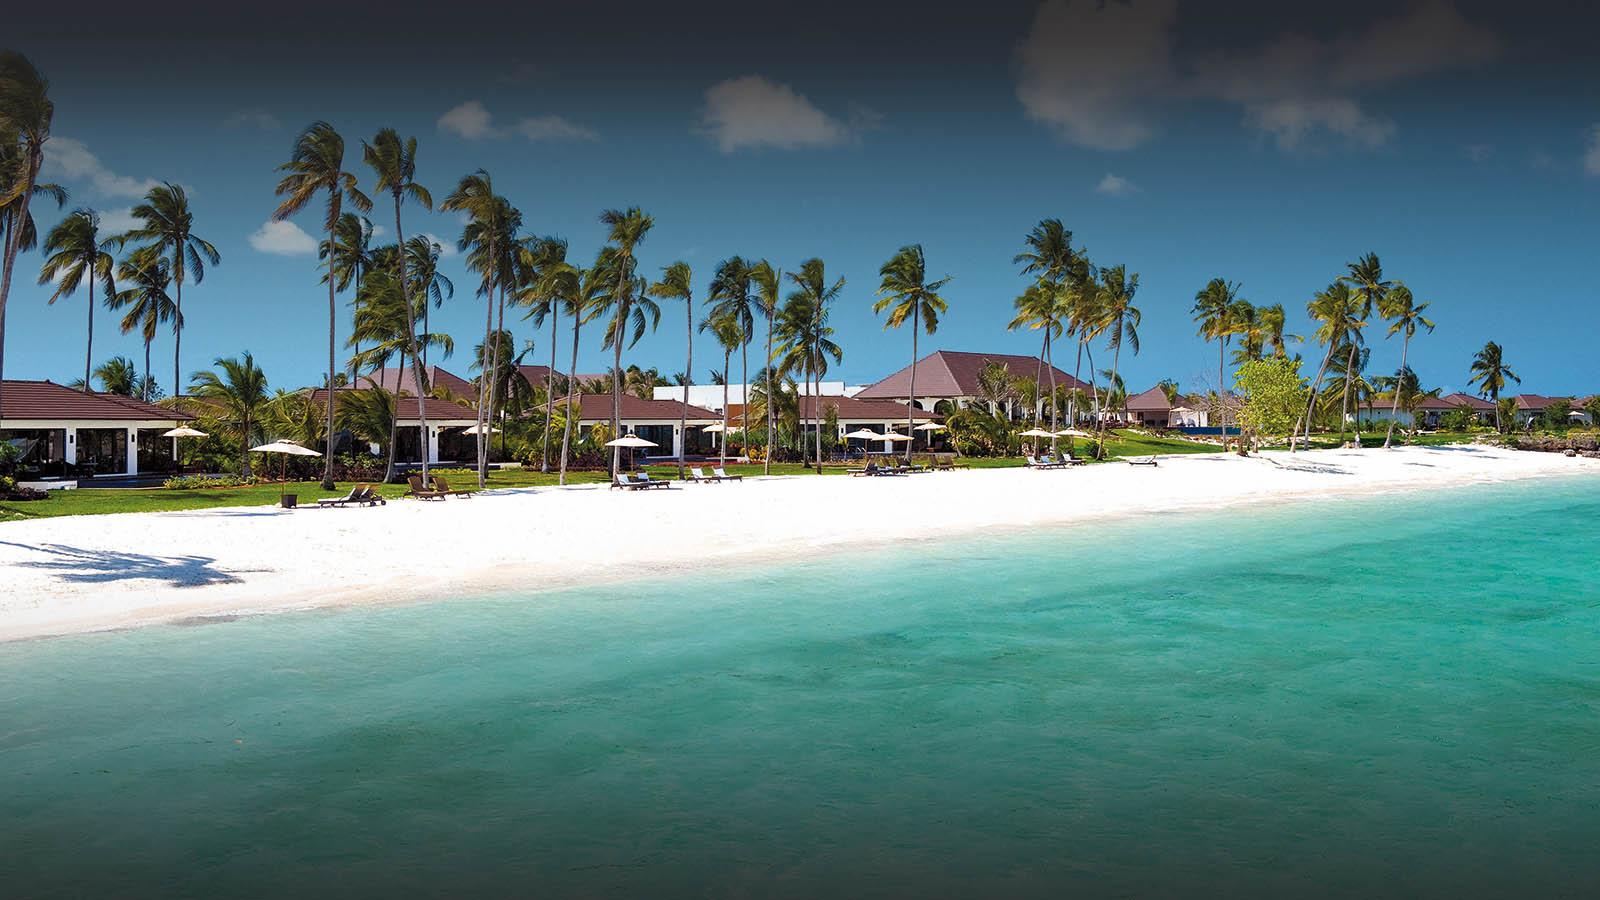 the residence south-of-zanzibar–kizimkazi-lodges-zambia-in-style-tanzania-stunningly-picturesque-island-beach